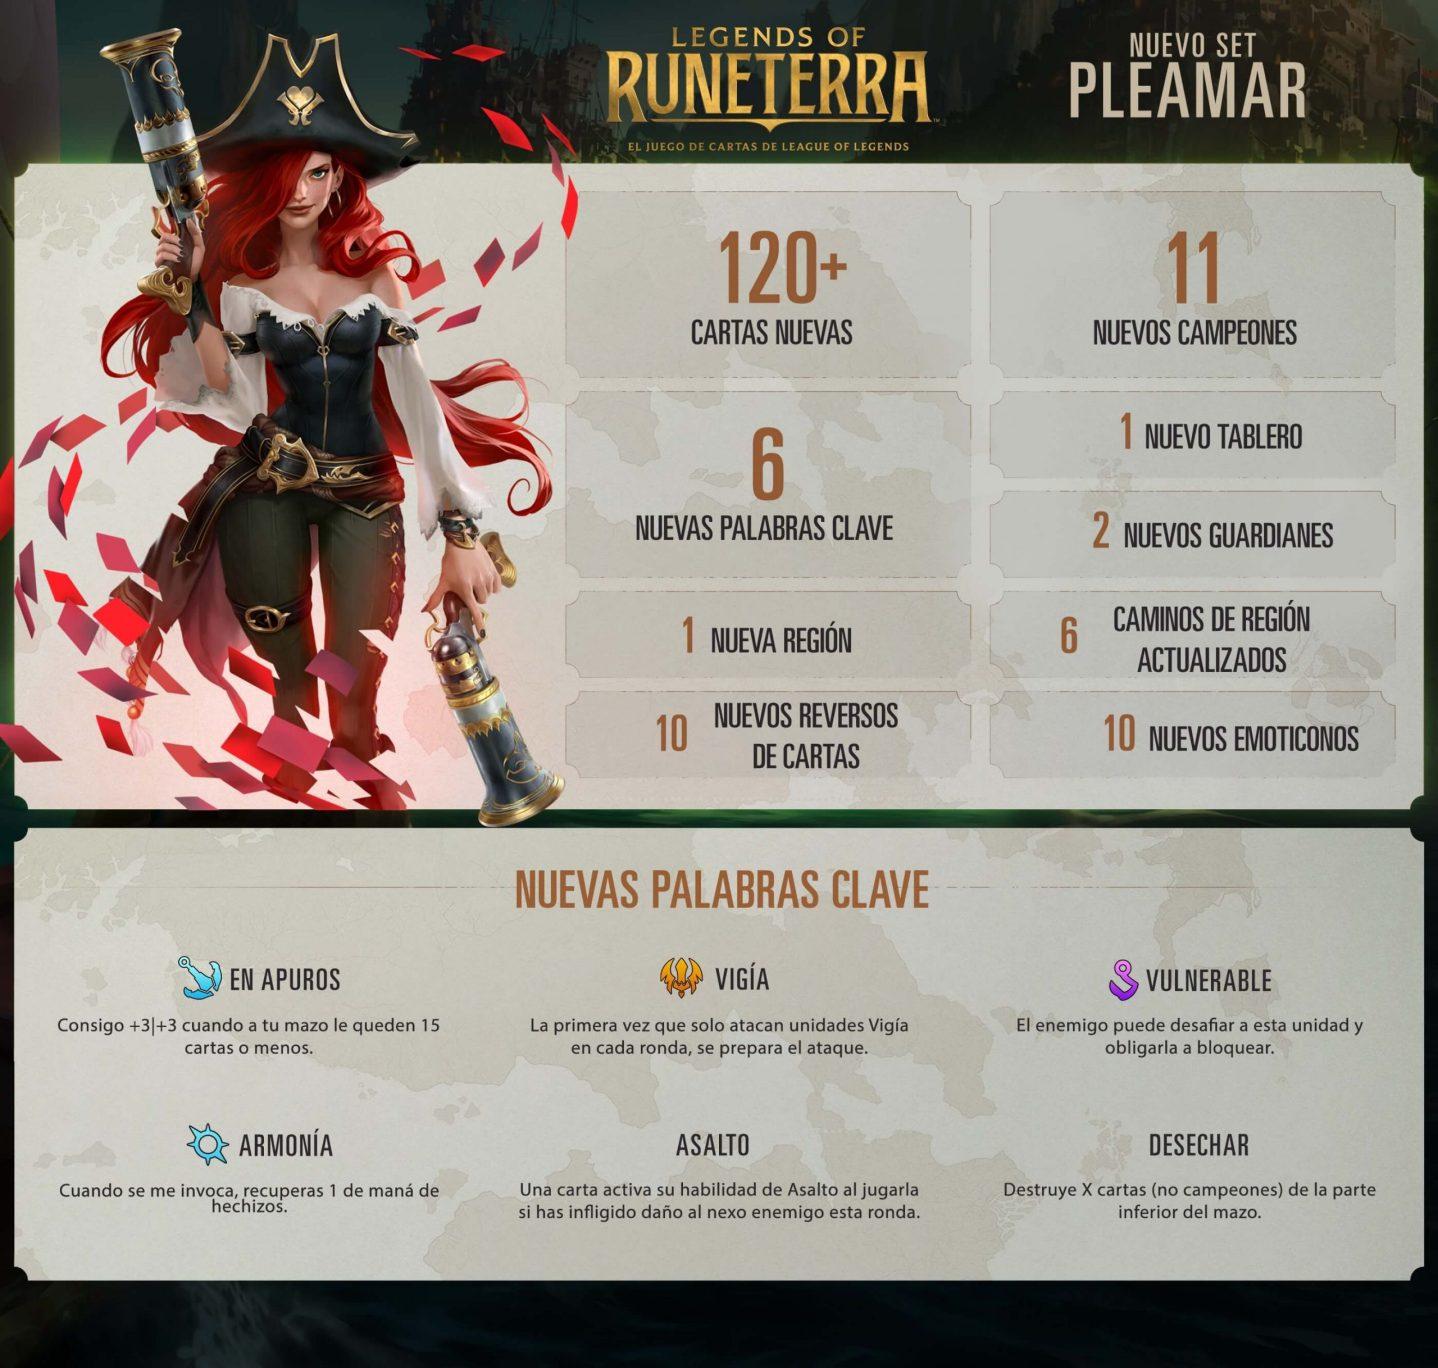 Legends of Runeterra Pleamar scaled